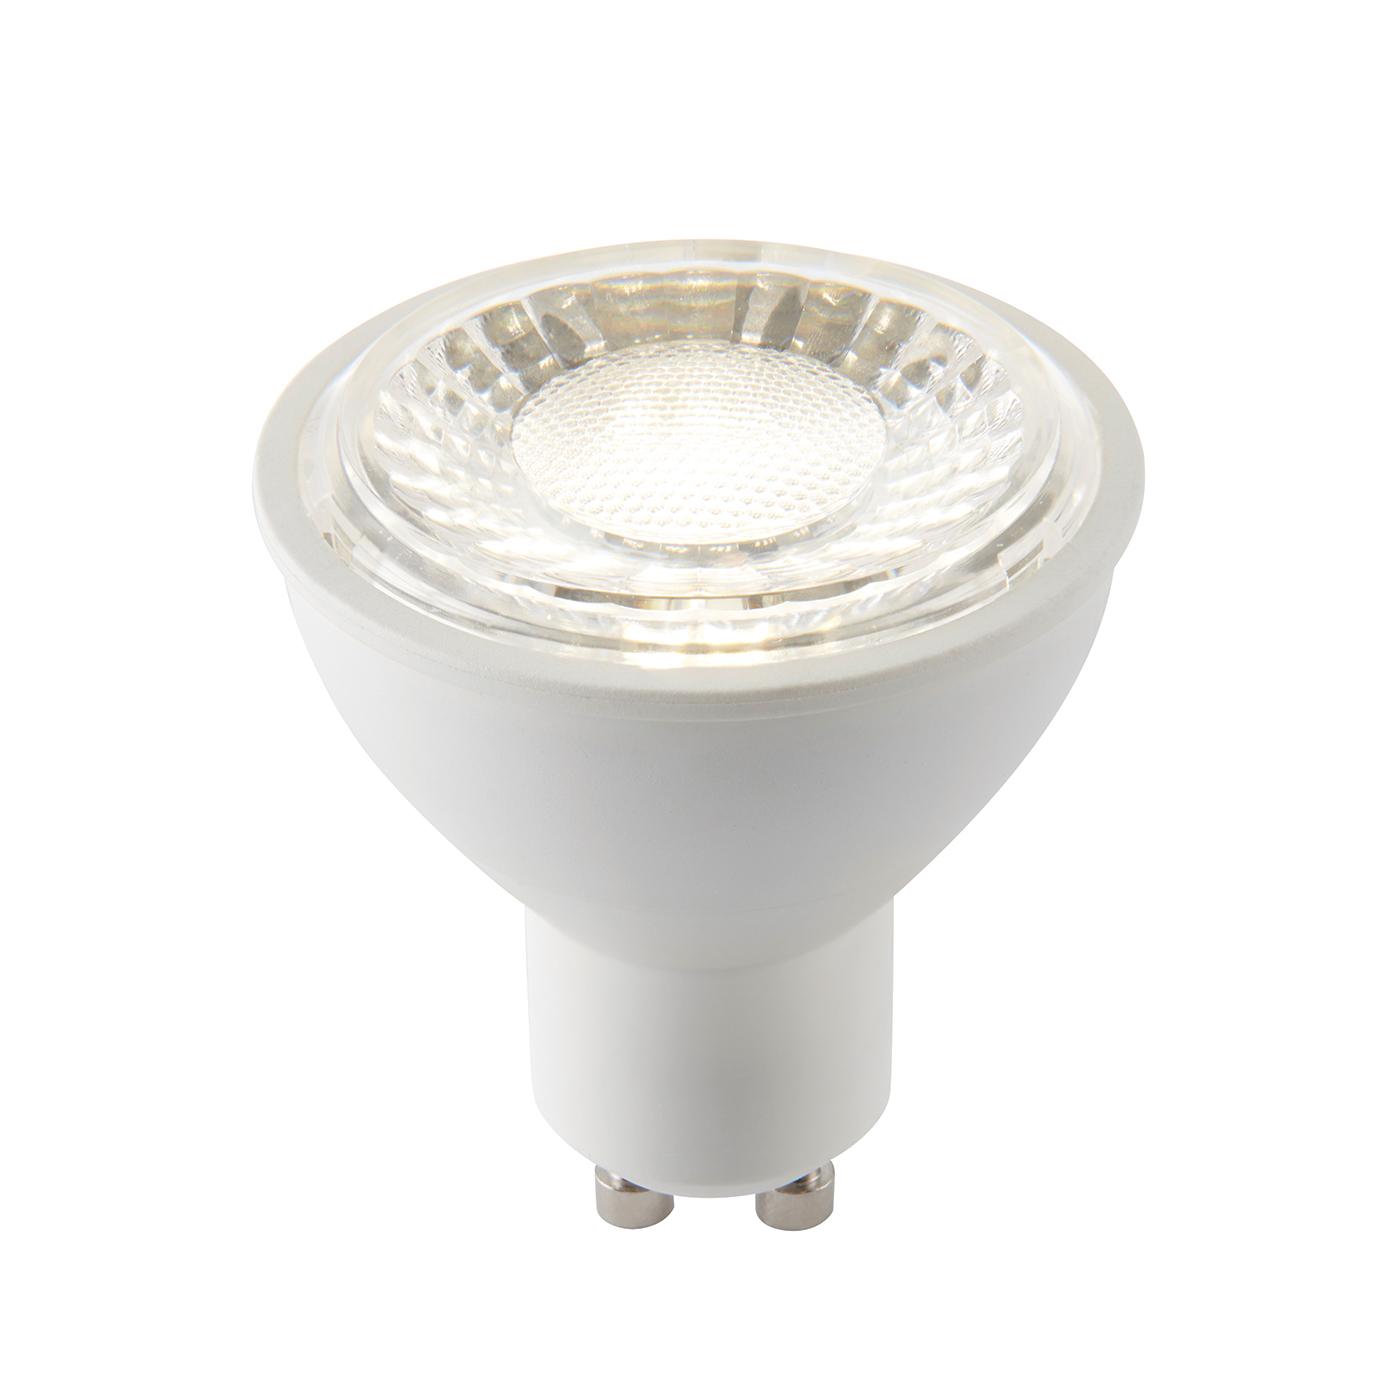 Endon 70054 LED SMD Lamp 4000K GU10 7W